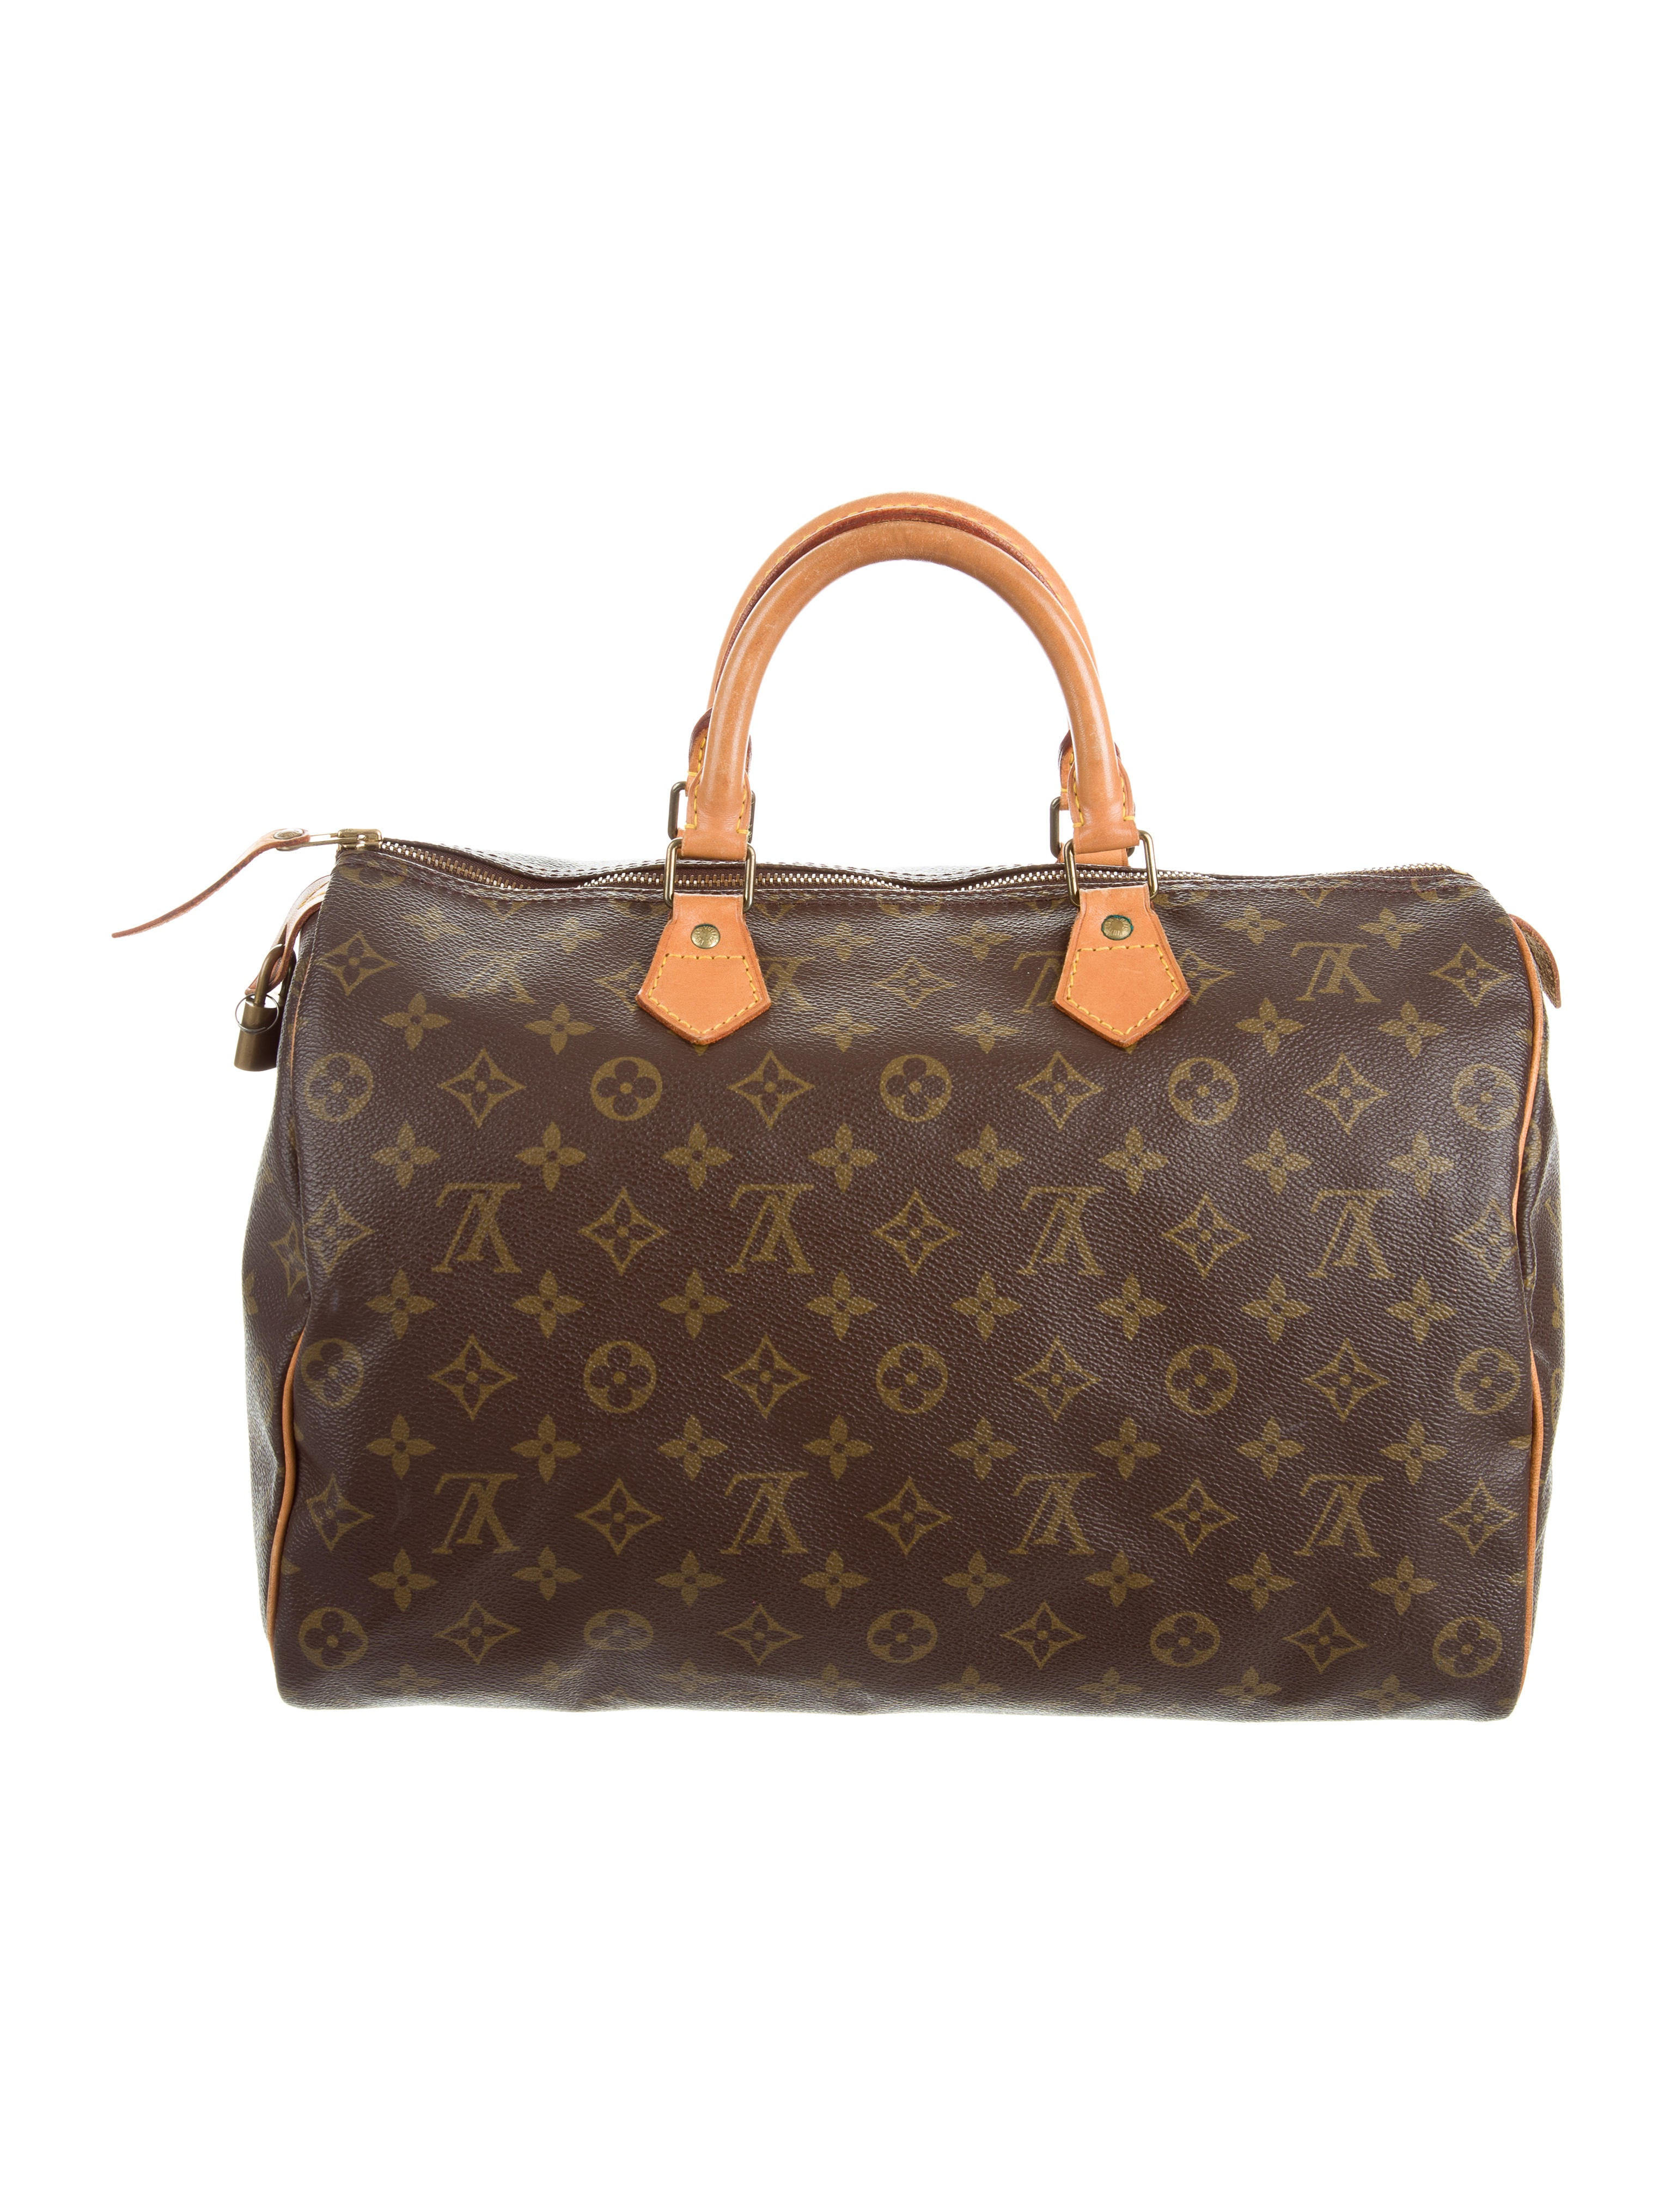 Louis vuitton monogram speedy 35 handbags lou120900 for Louis vuitton miroir speedy 35